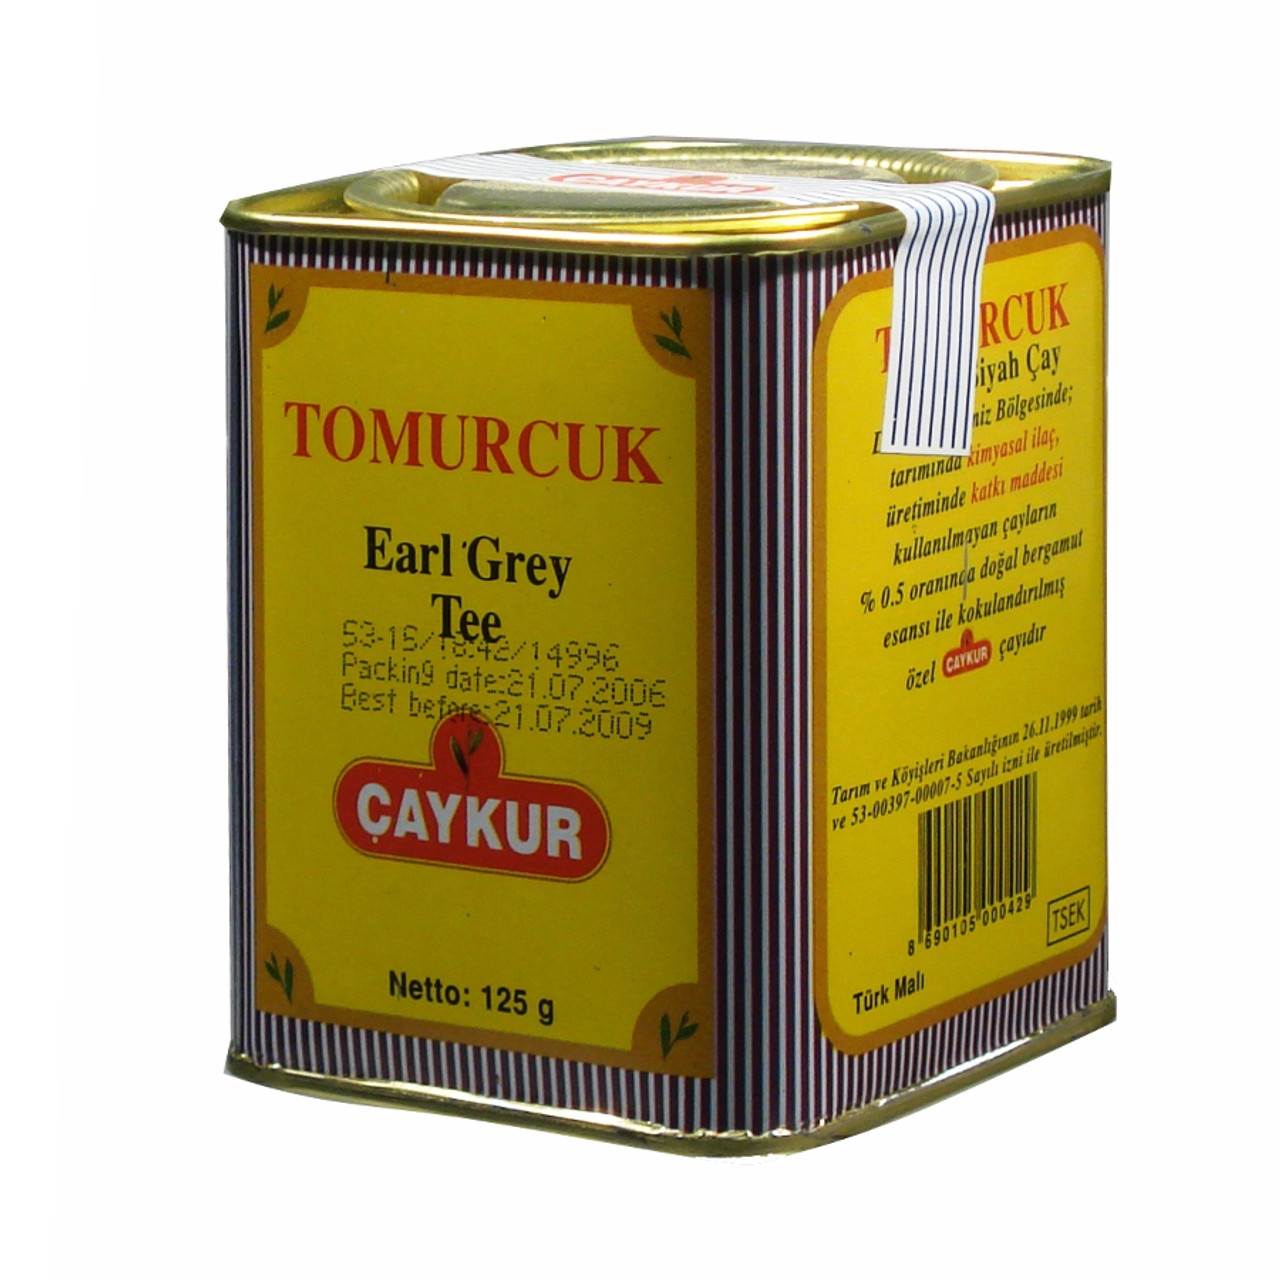 CAYKUR TOMURCUK EARL GREY TEA  (130G)